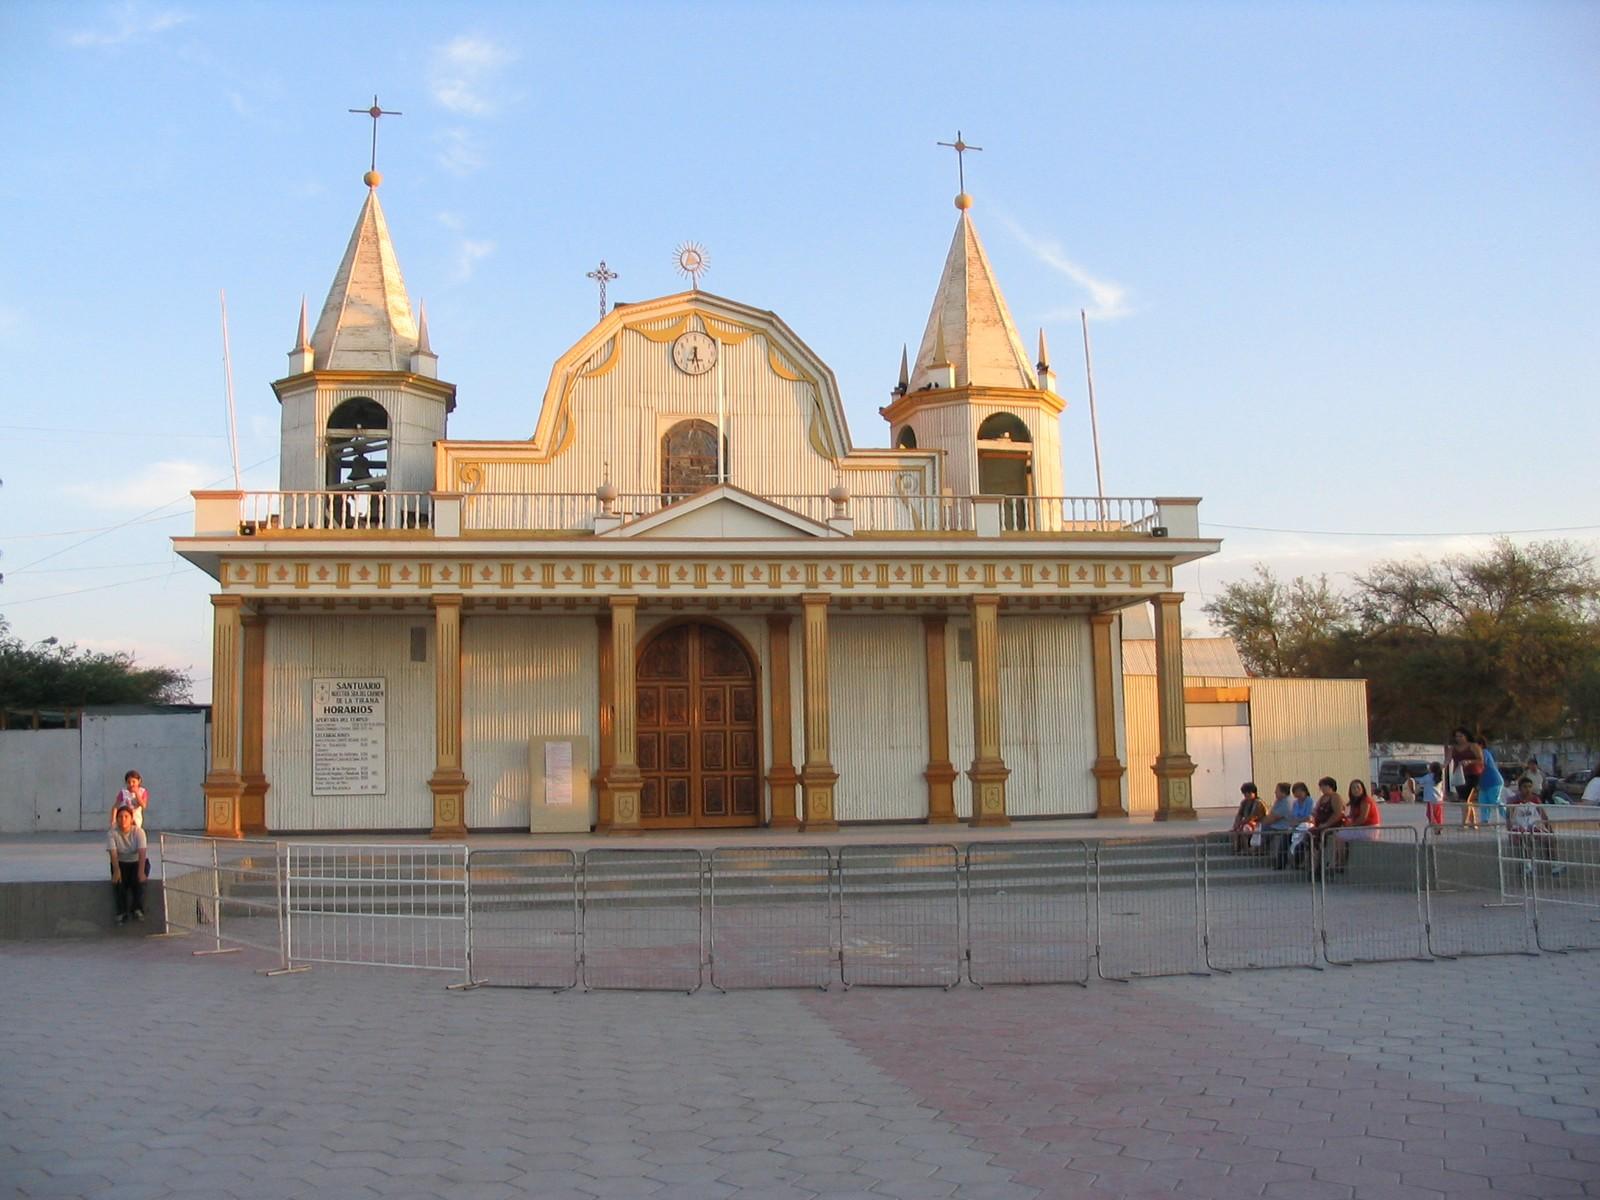 Nuestra Señora del Carmen de la Tirana, Extraña Historia Sobrenatural, Chile (16 jul)